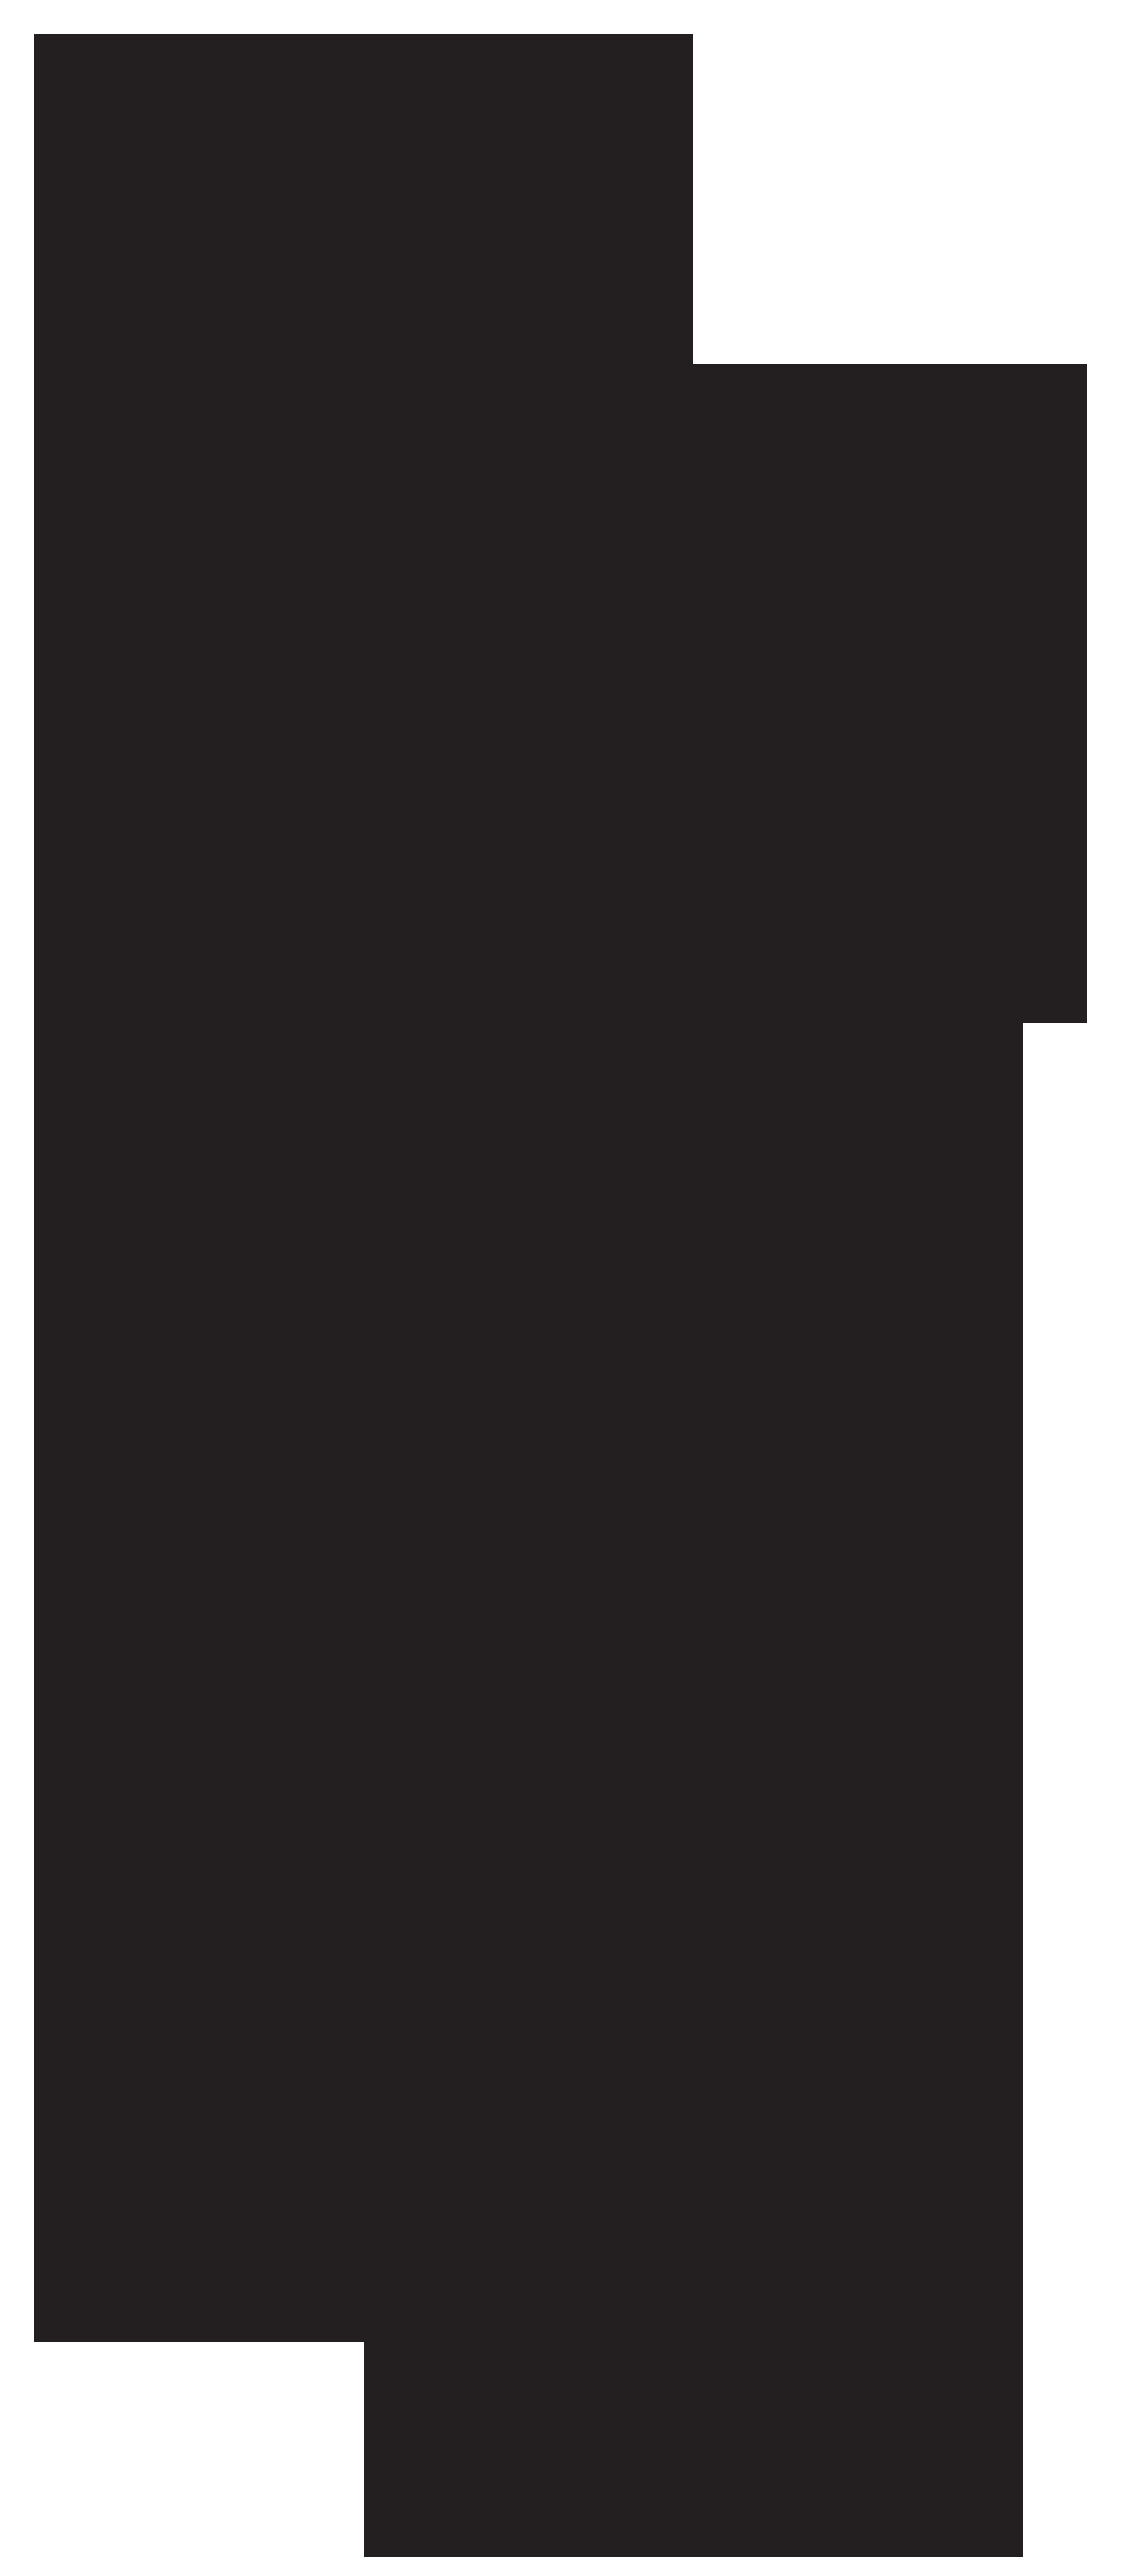 Boxer clipart. Silhouette clip art image